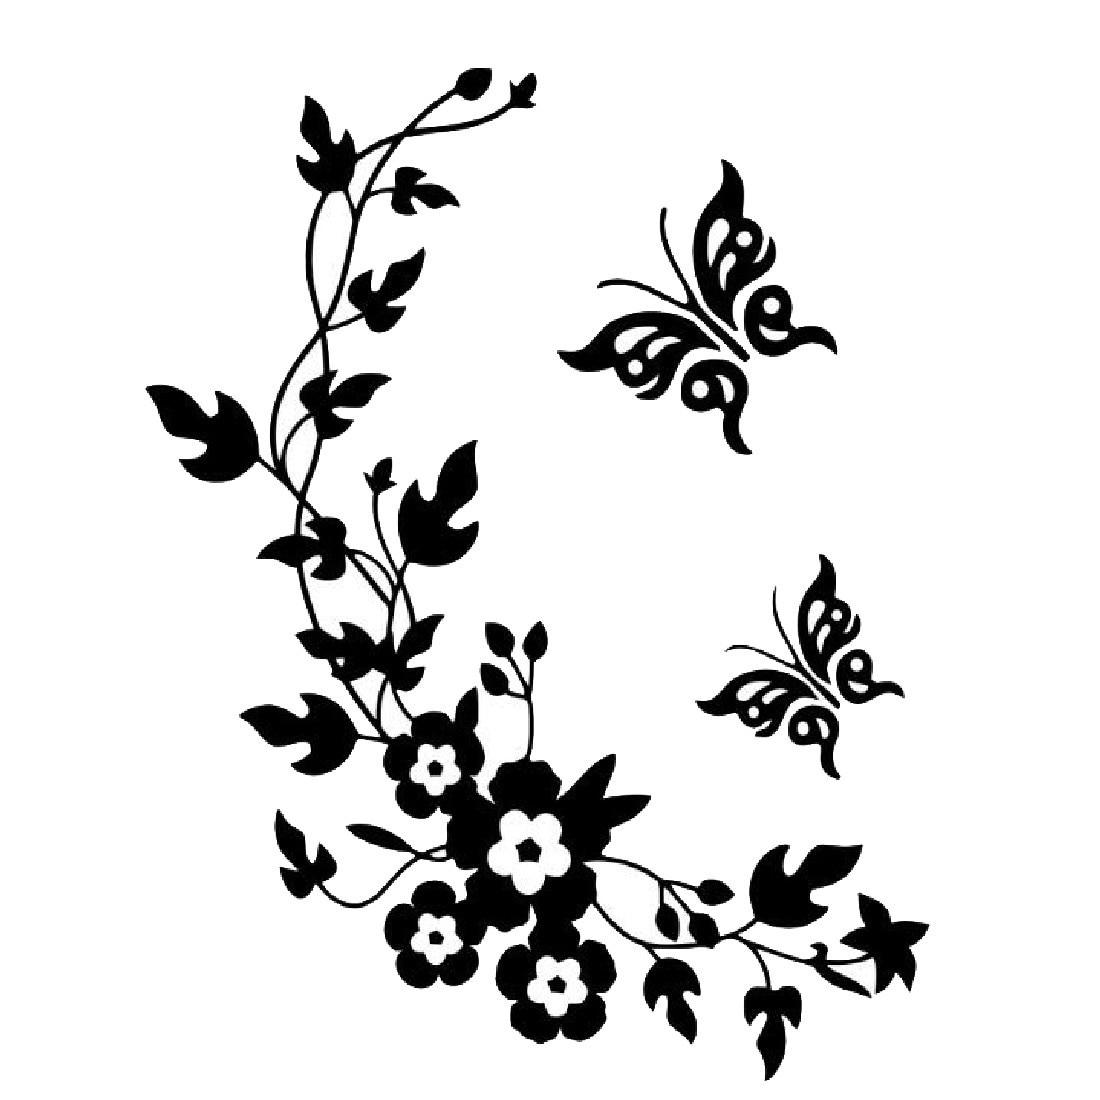 aliexpress com buy removable diy mural wallpaper black butterfly